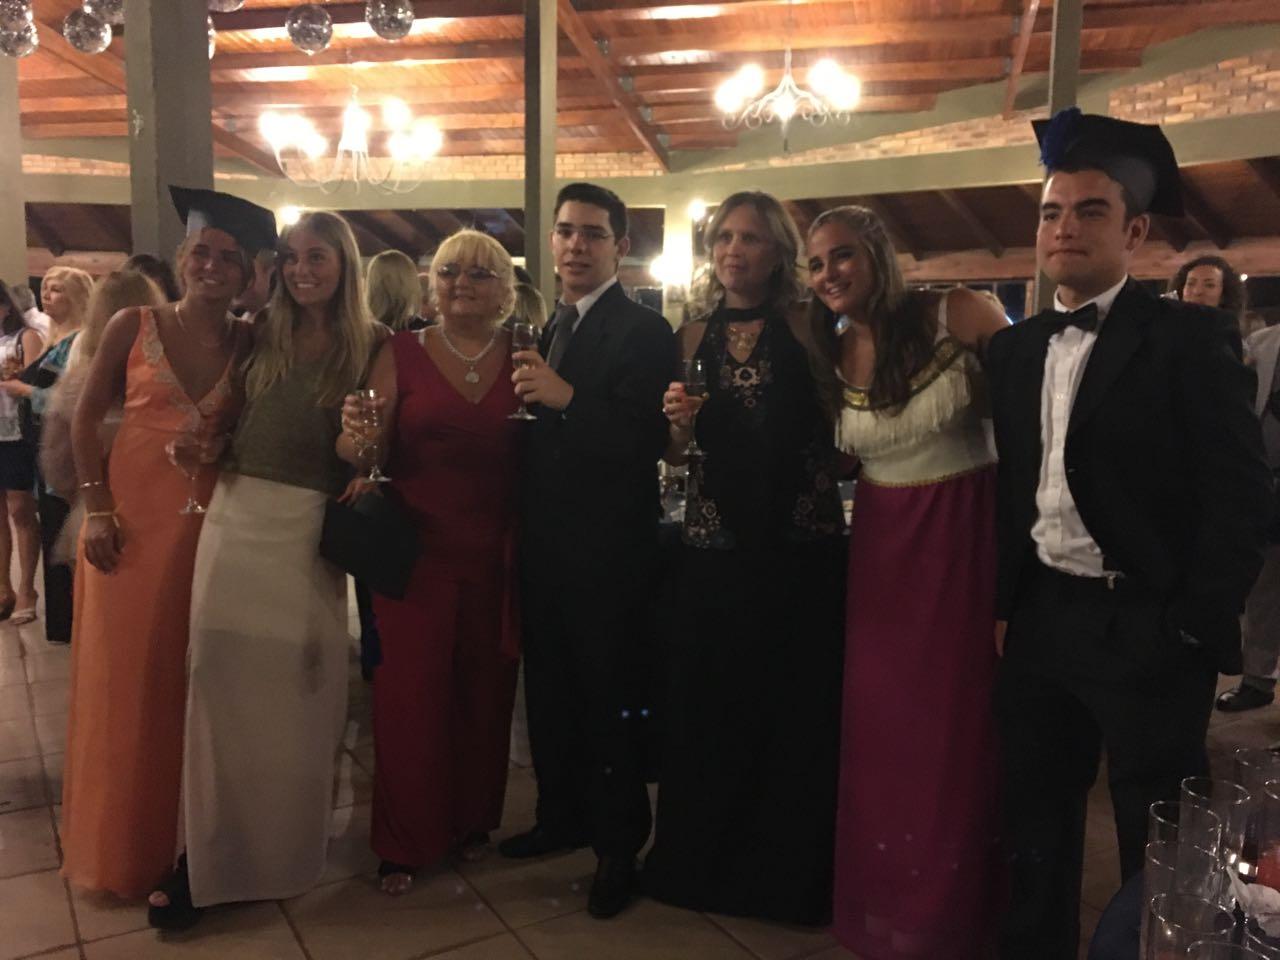 Isabella Di Donato,María Victoria Paganini, Prof. Marina Da Rosa,Francisco Perín,Prof. Serrana duarter, Camila Rivas, Francisco Noboa